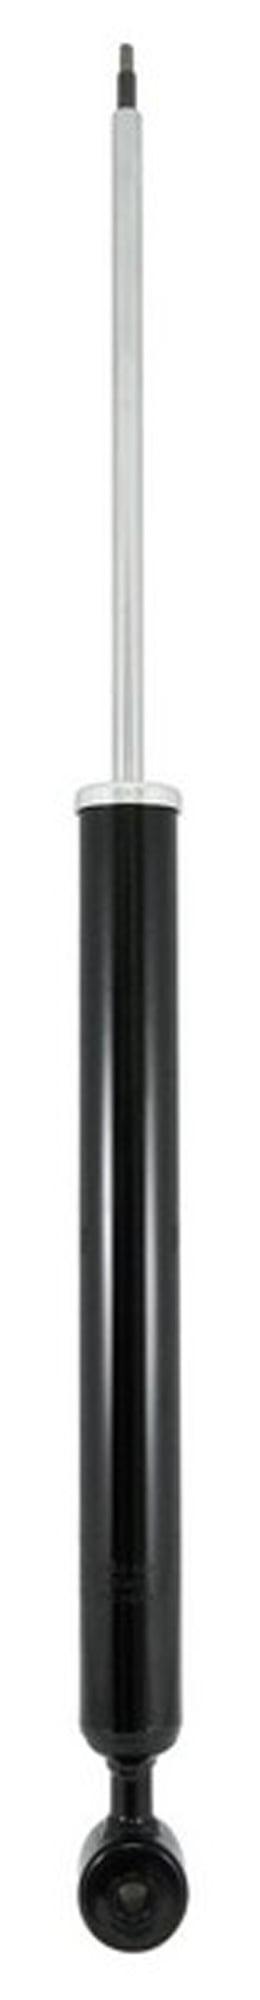 Amortecedor Traseiro Fiesta New Ka Ka+ Cofap GB48250